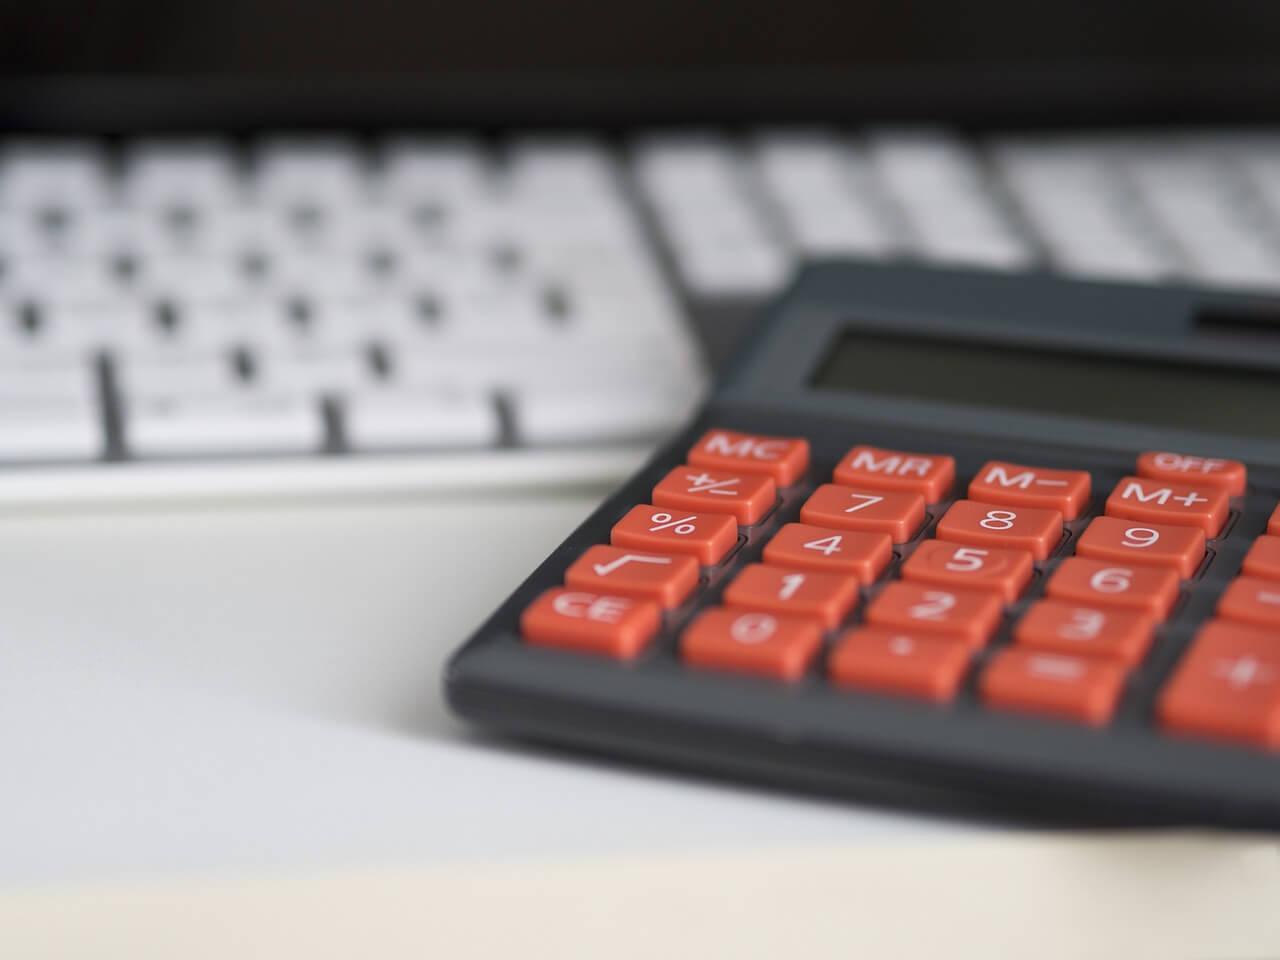 Comprendre et analyser un bilan comptable